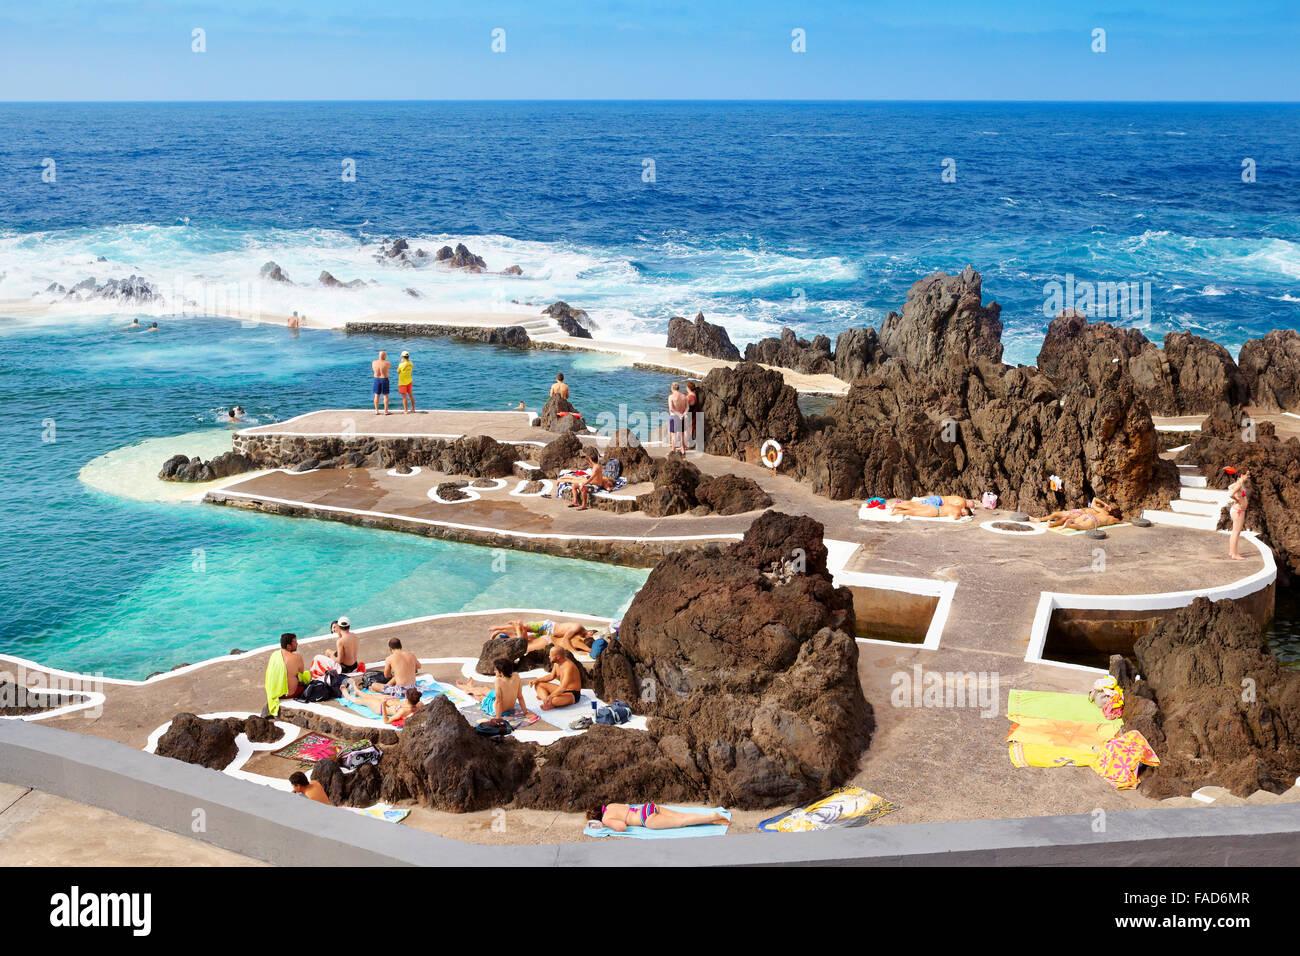 Swimming Pool With Ocean Water Porto Moniz Madeira Island Portugal Stock Photo Royalty Free